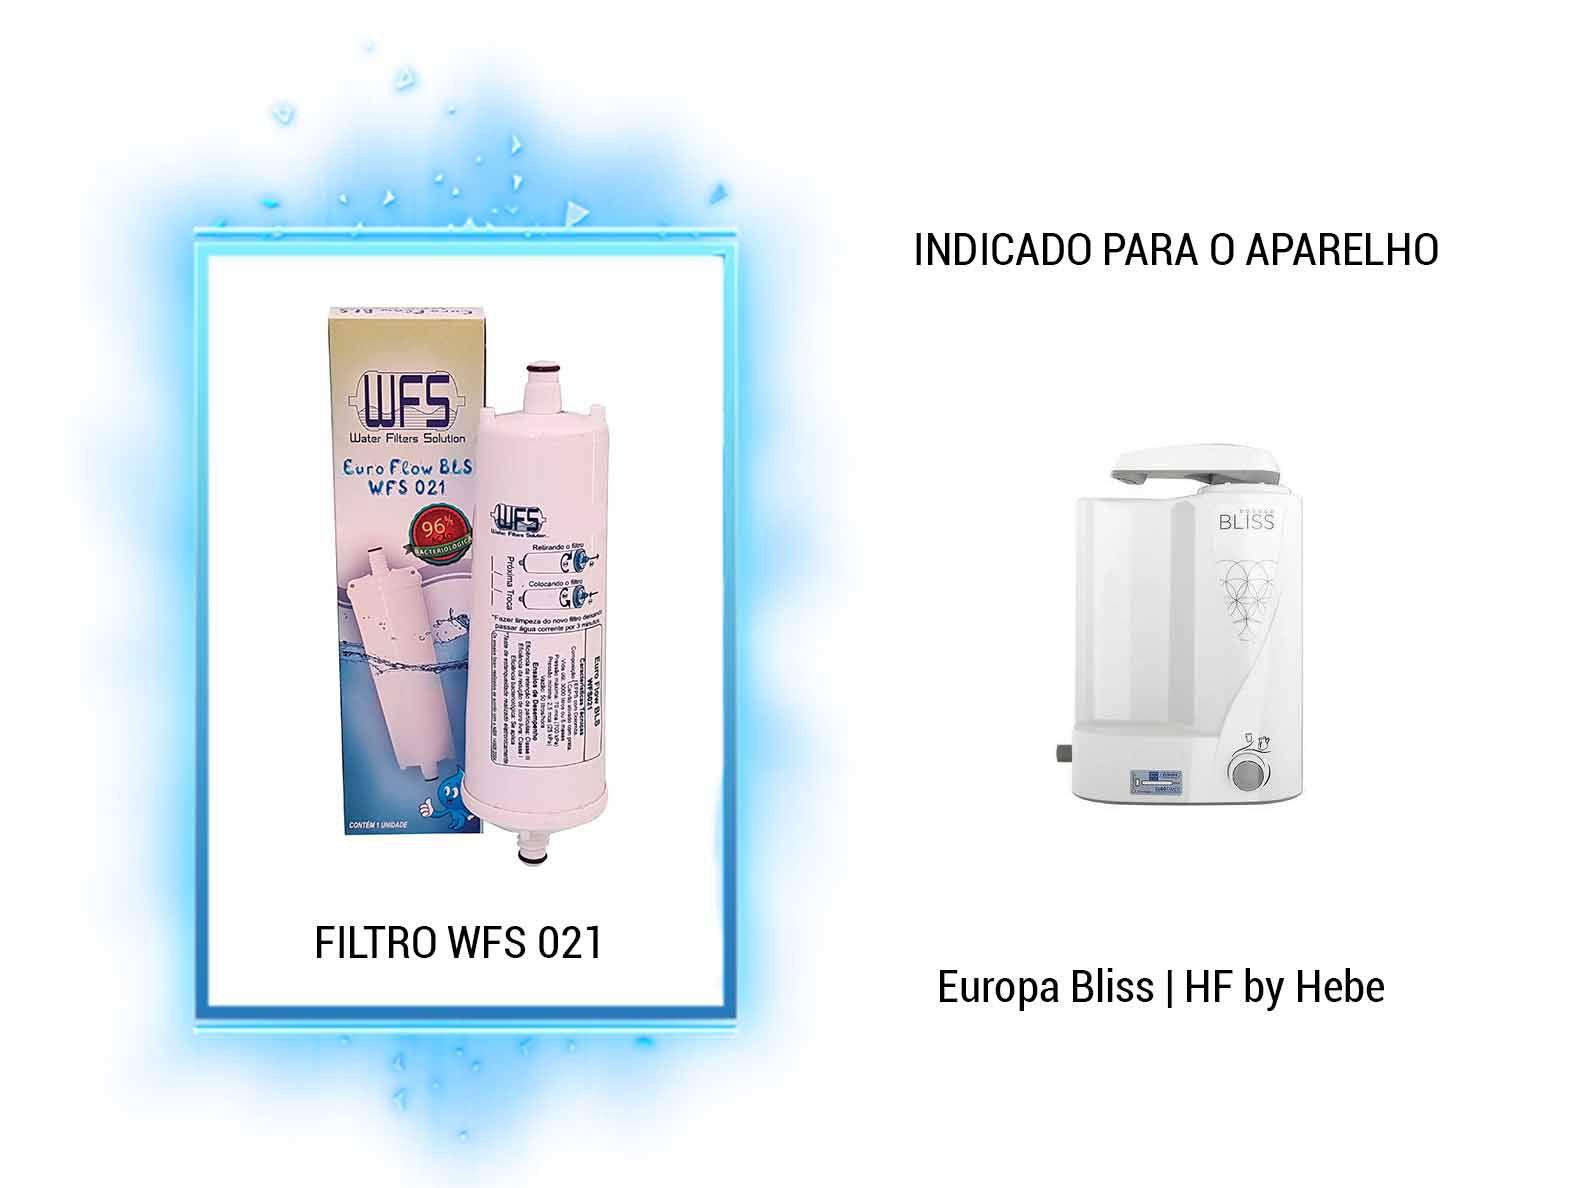 Refil Purificador Europa Bliss| Wfs 021 | Europa Flow BLS